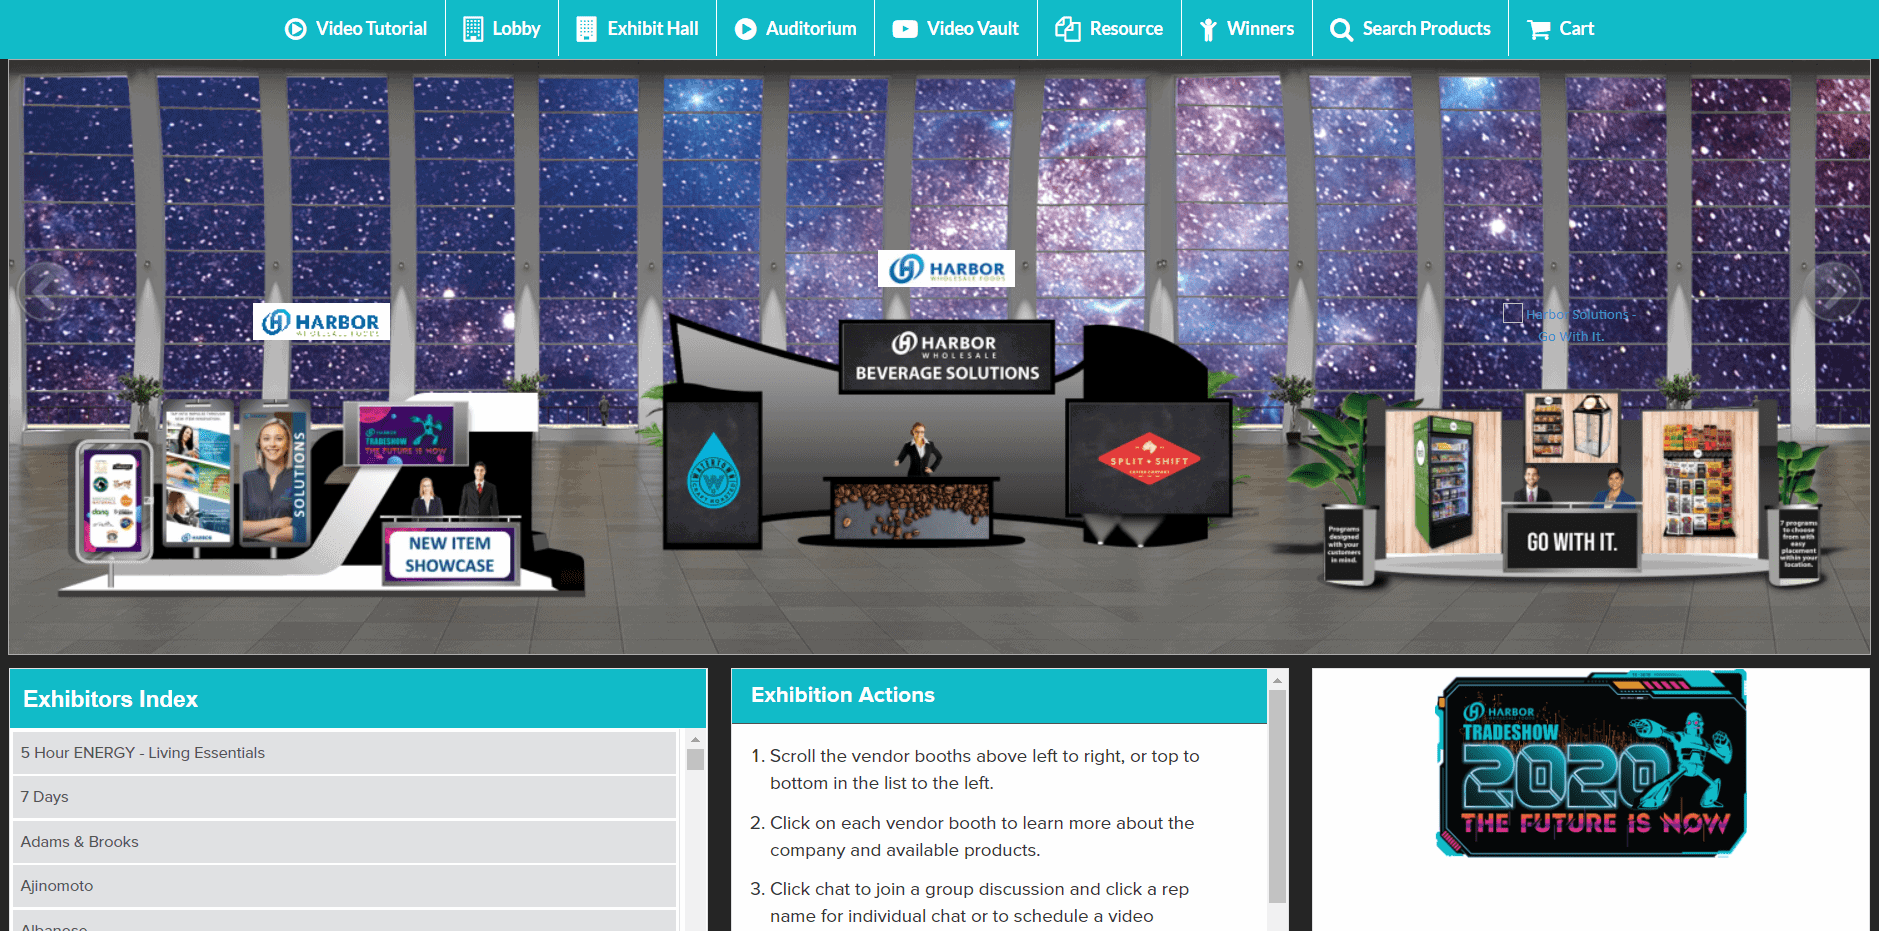 exhibit hall in virtual trade show